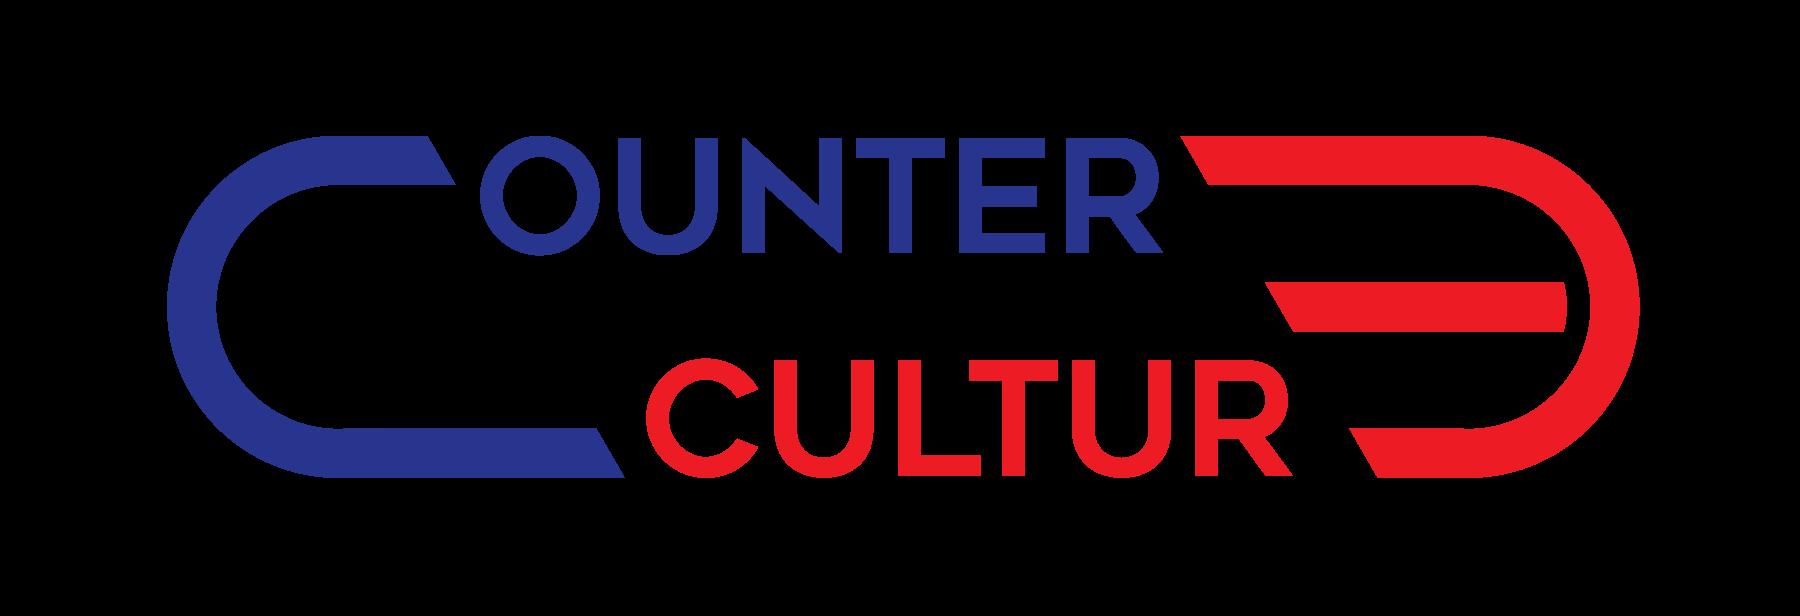 Countercultur3